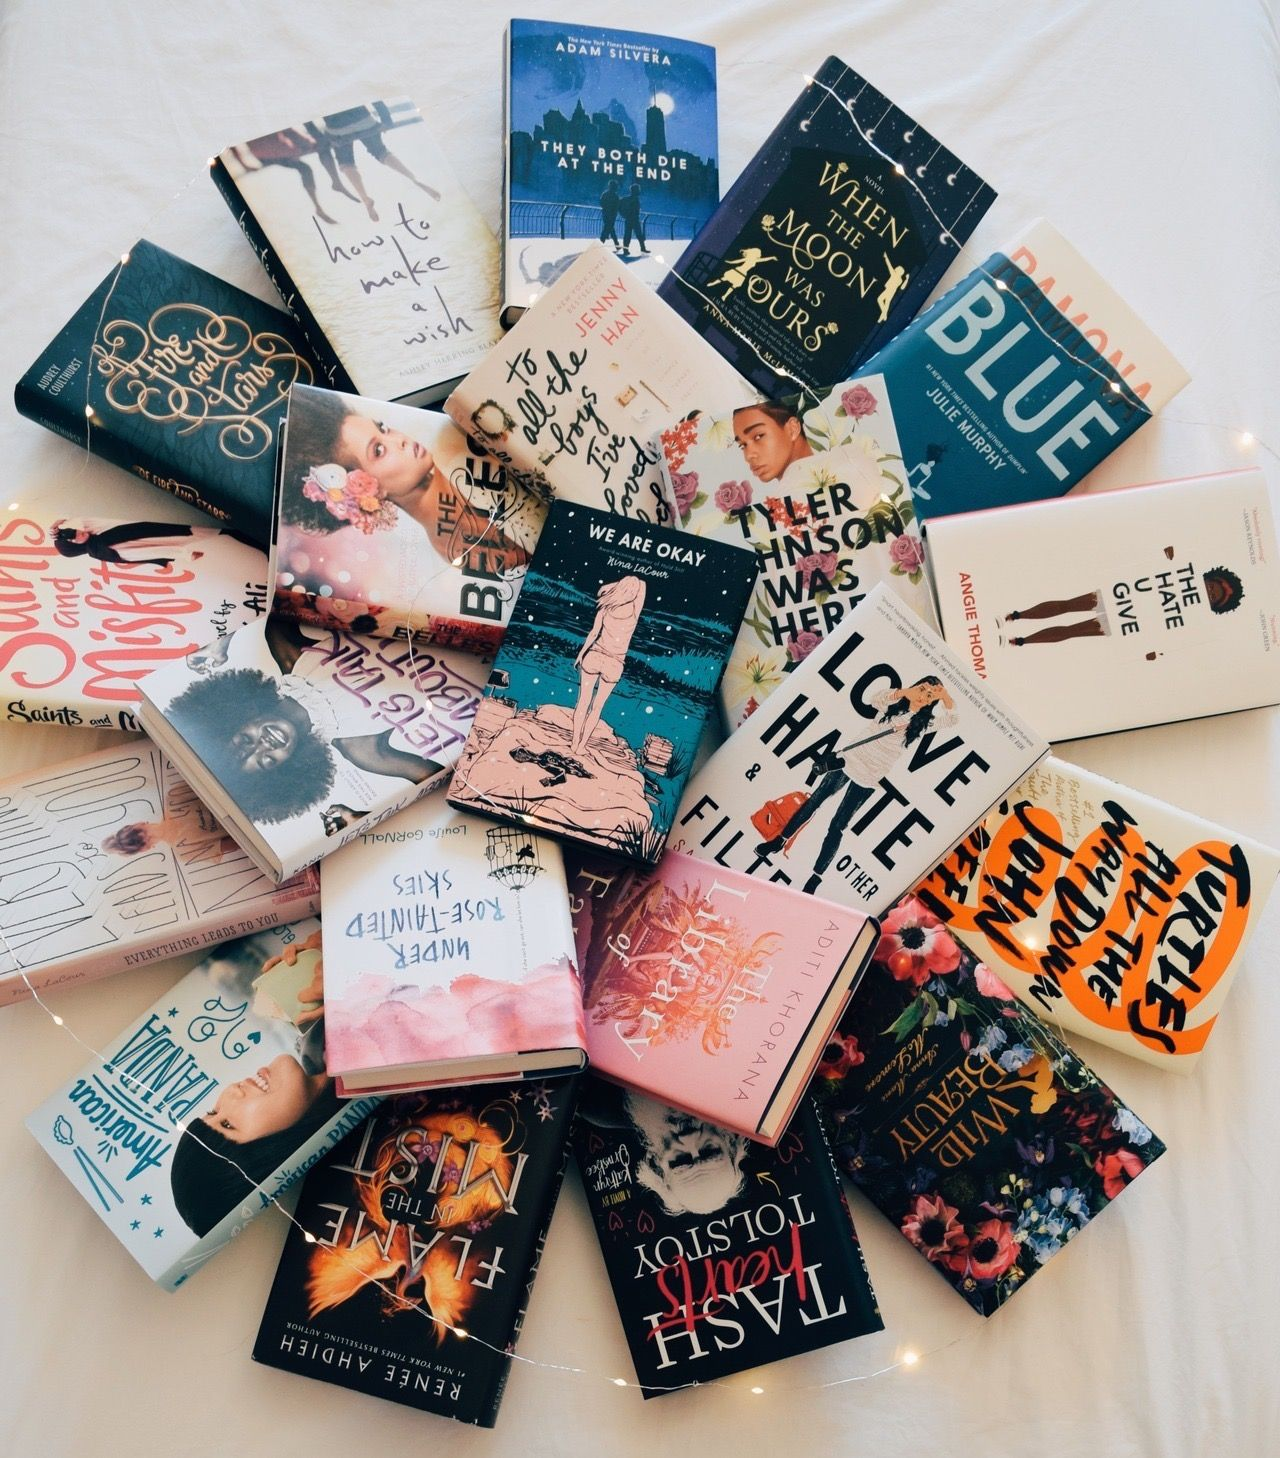 Pin by Monika Lewandowska on • Book Worm • | Books, Book lovers, Books to  read